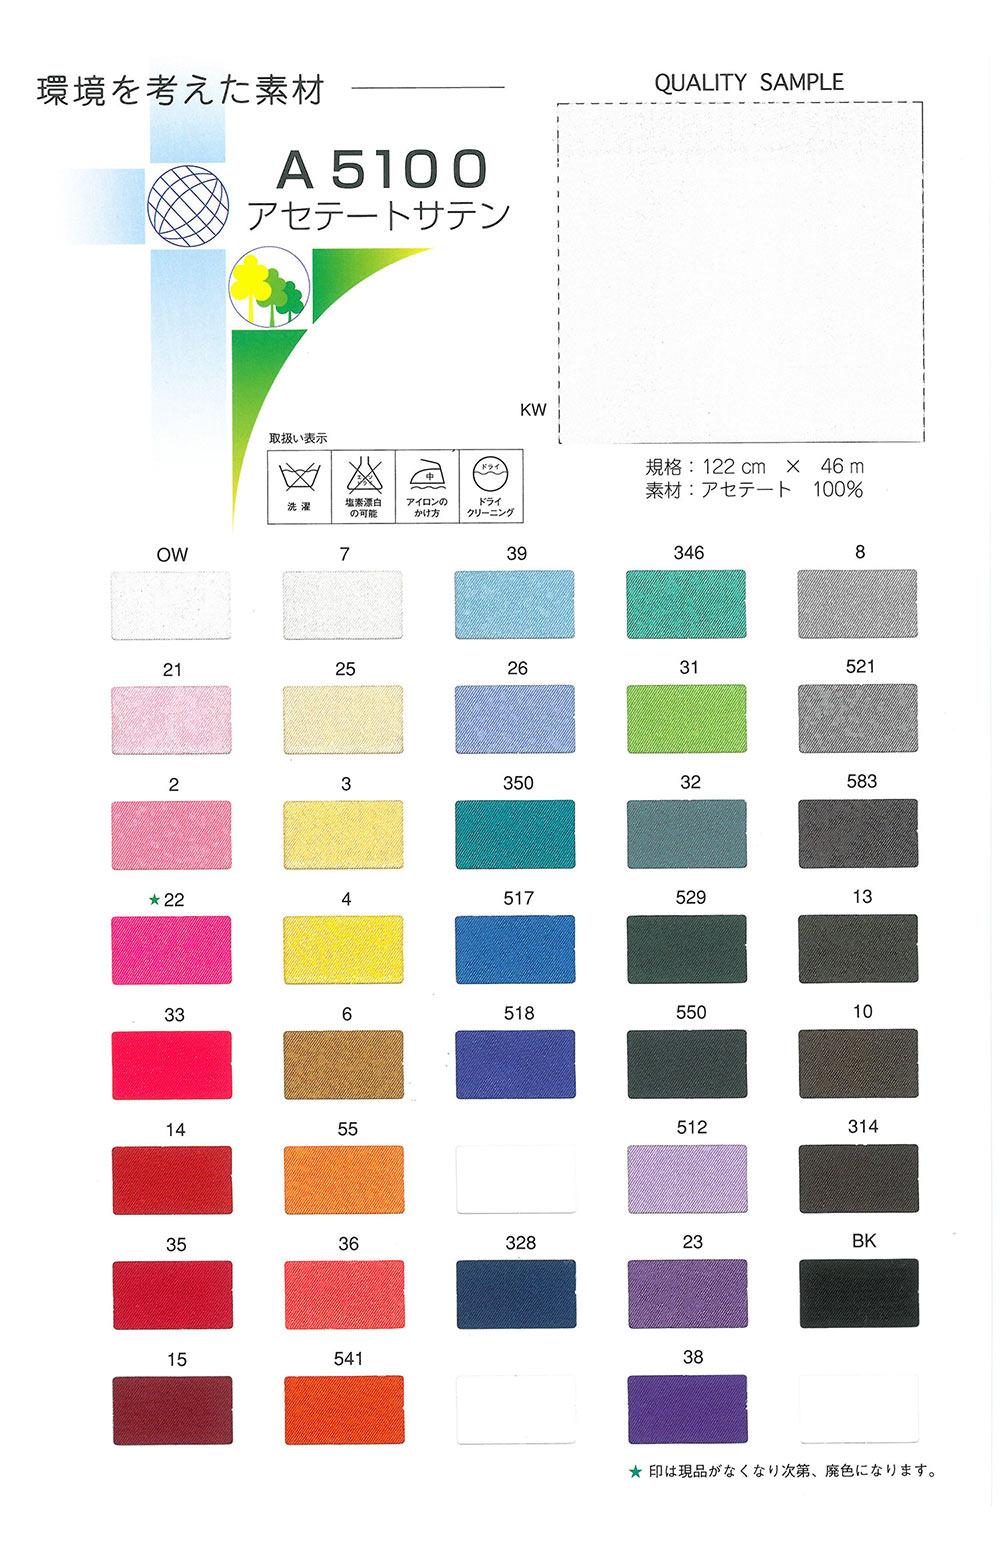 A5100 アセテートサテン[裏地] ニシヤマ/オークラ商事 - ApparelX アパレル資材卸通販